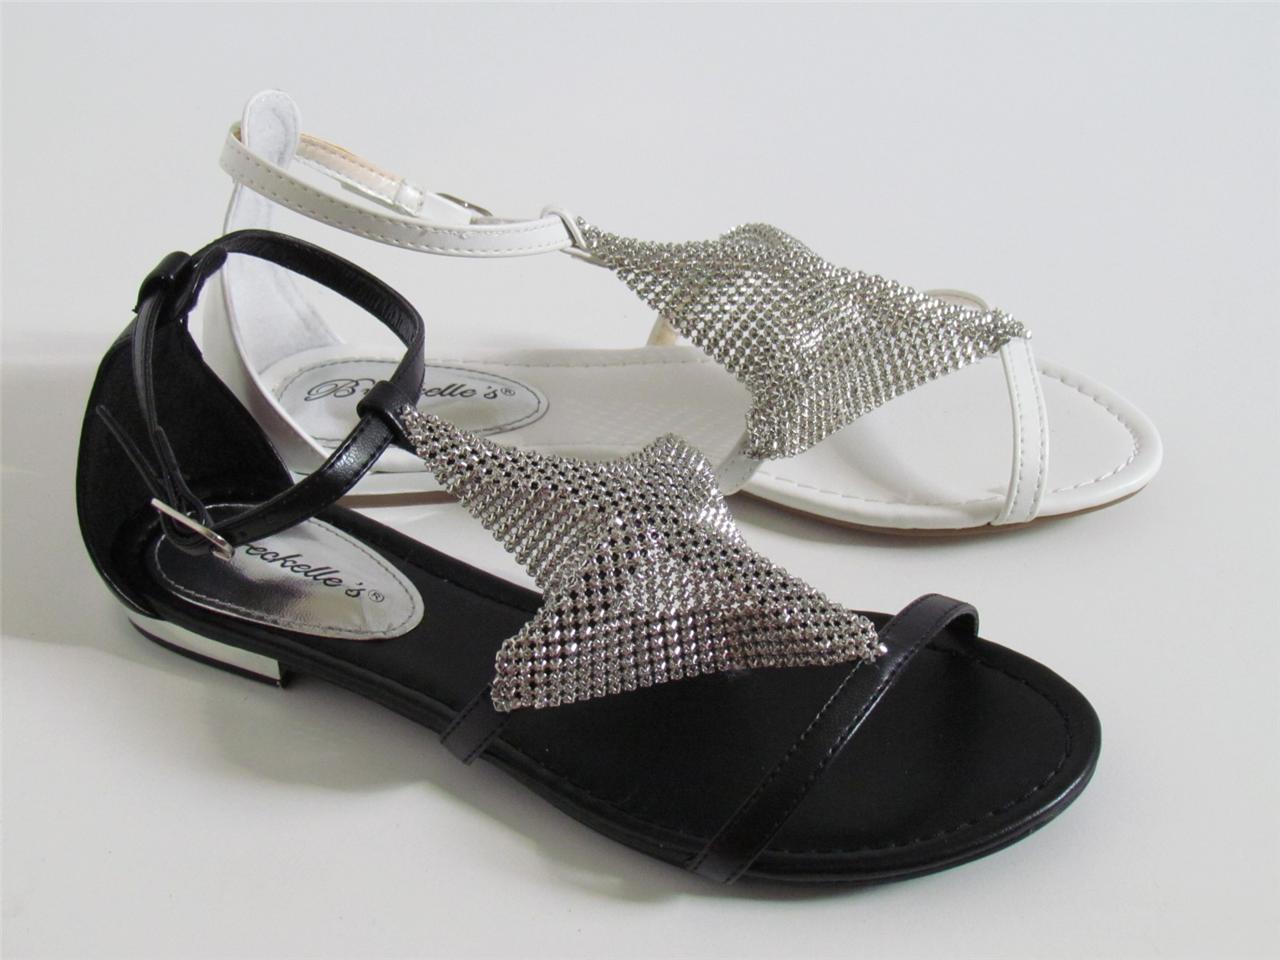 Black mesh sandals - Image Is Loading New Metallic Metal Mesh Ankle T Strap Gladiator